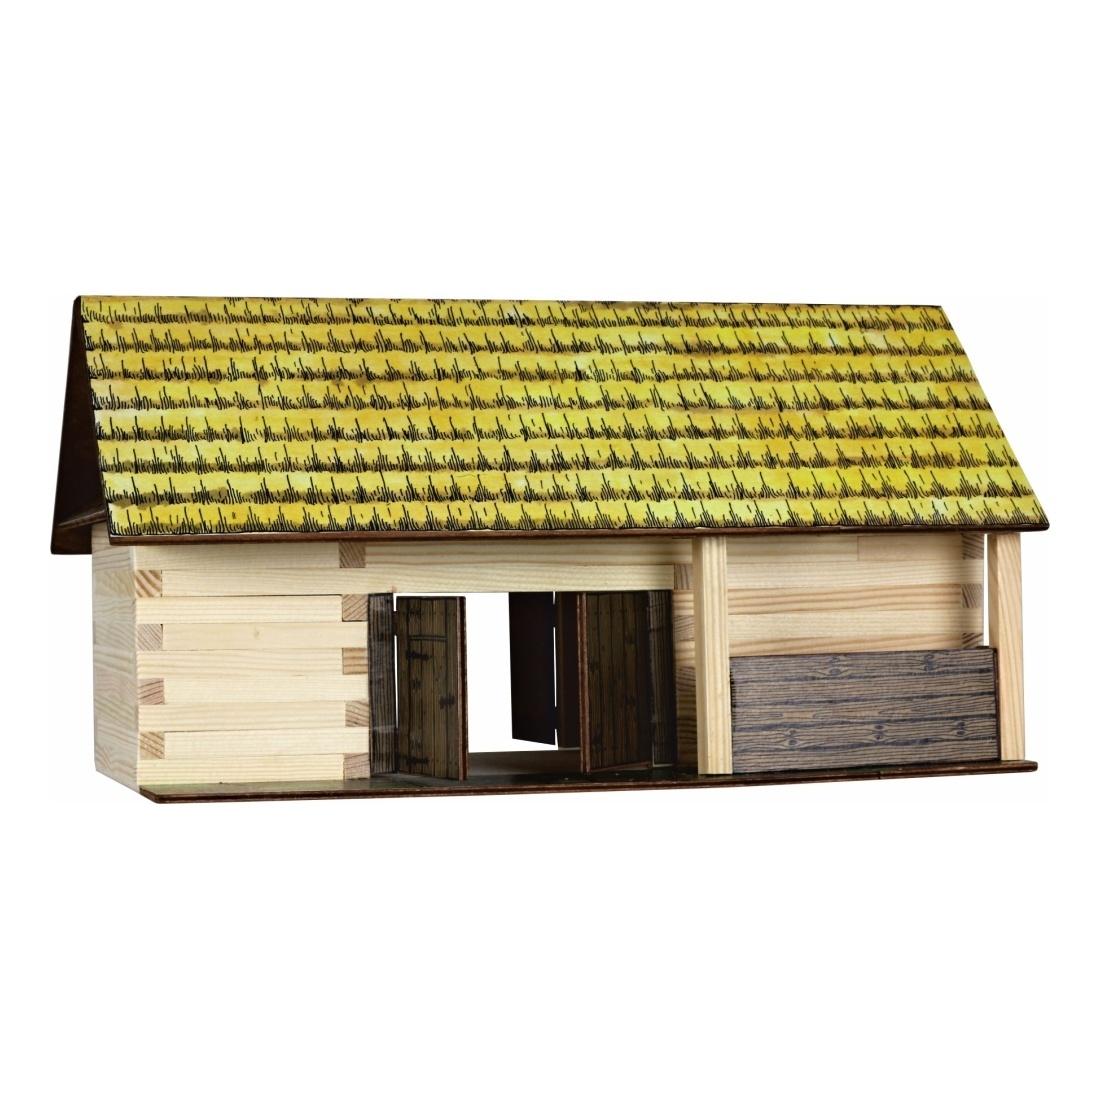 Walachia Dřevěná slepovací stavebnice Stodola